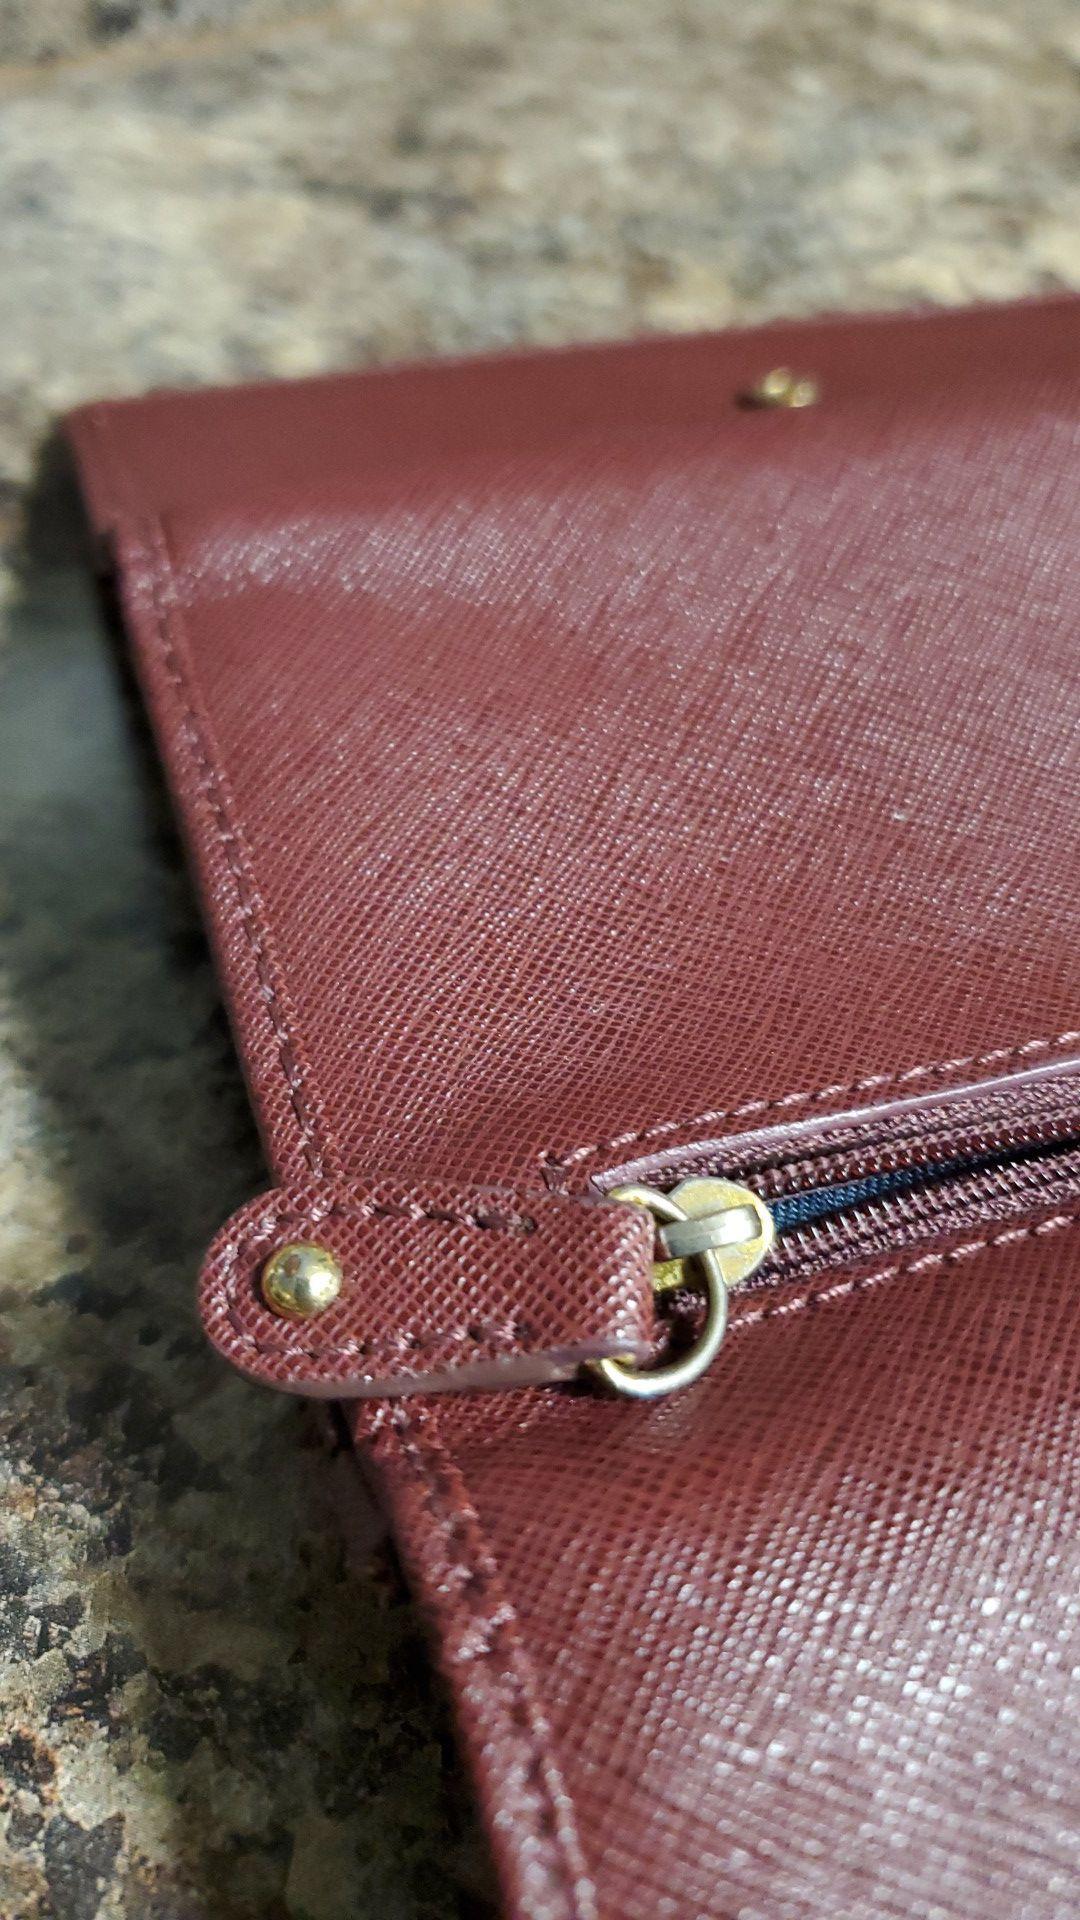 Maroon Tommy Hilfiger wallet.